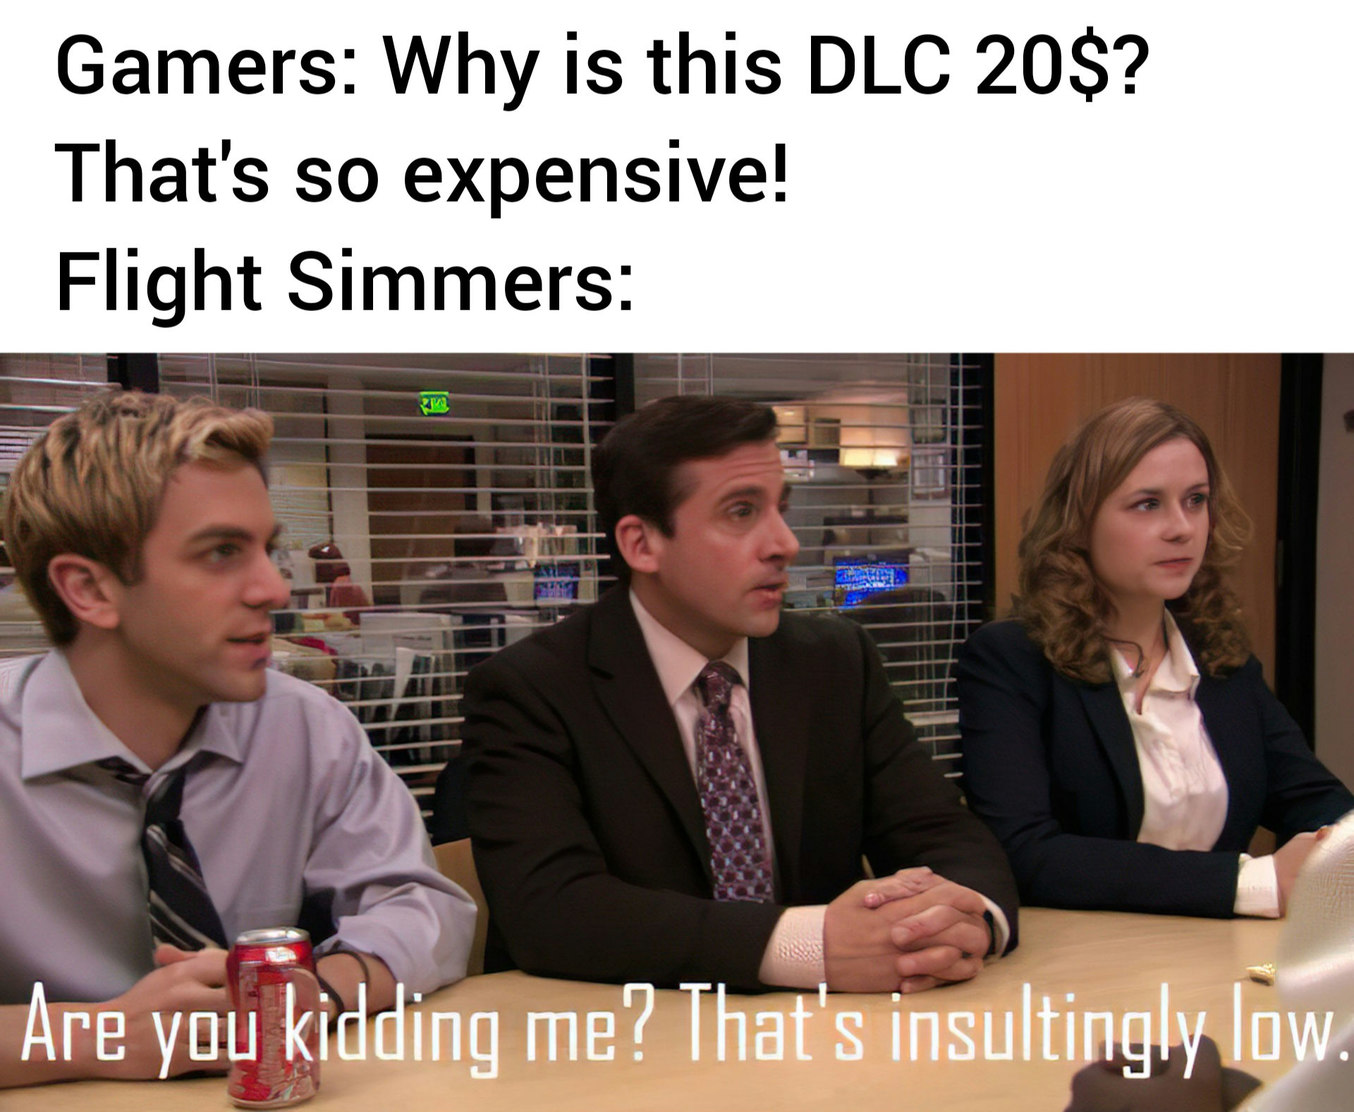 I think I'm broke. - meme